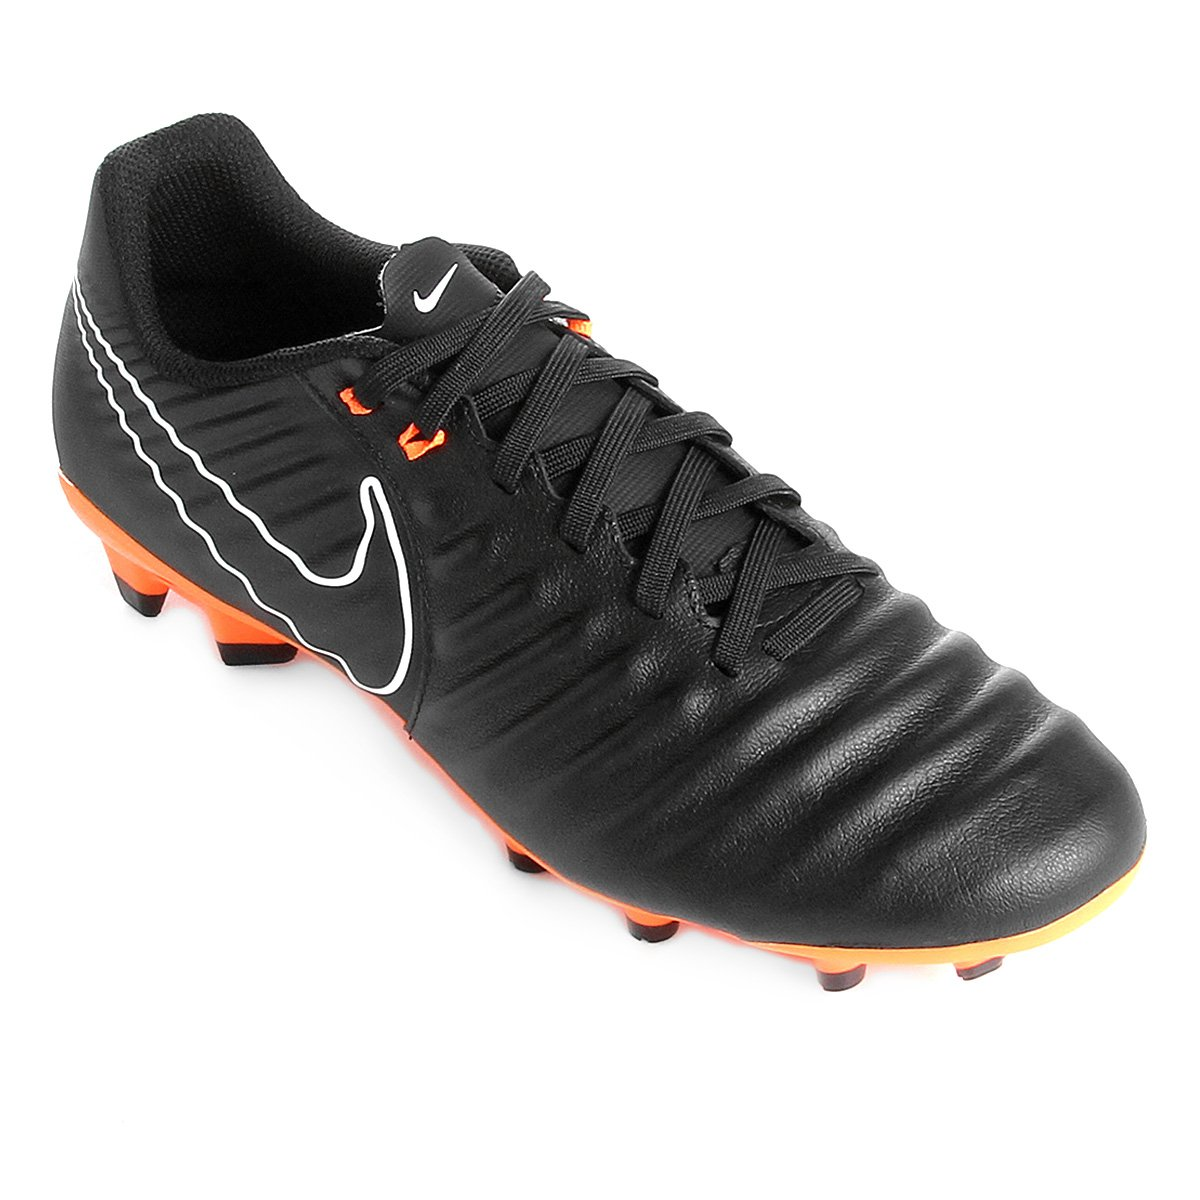 Chuteira Campo Nike Tiempo Legend 7 Academy FG - Preto e Laranja ... 817202667c8b5